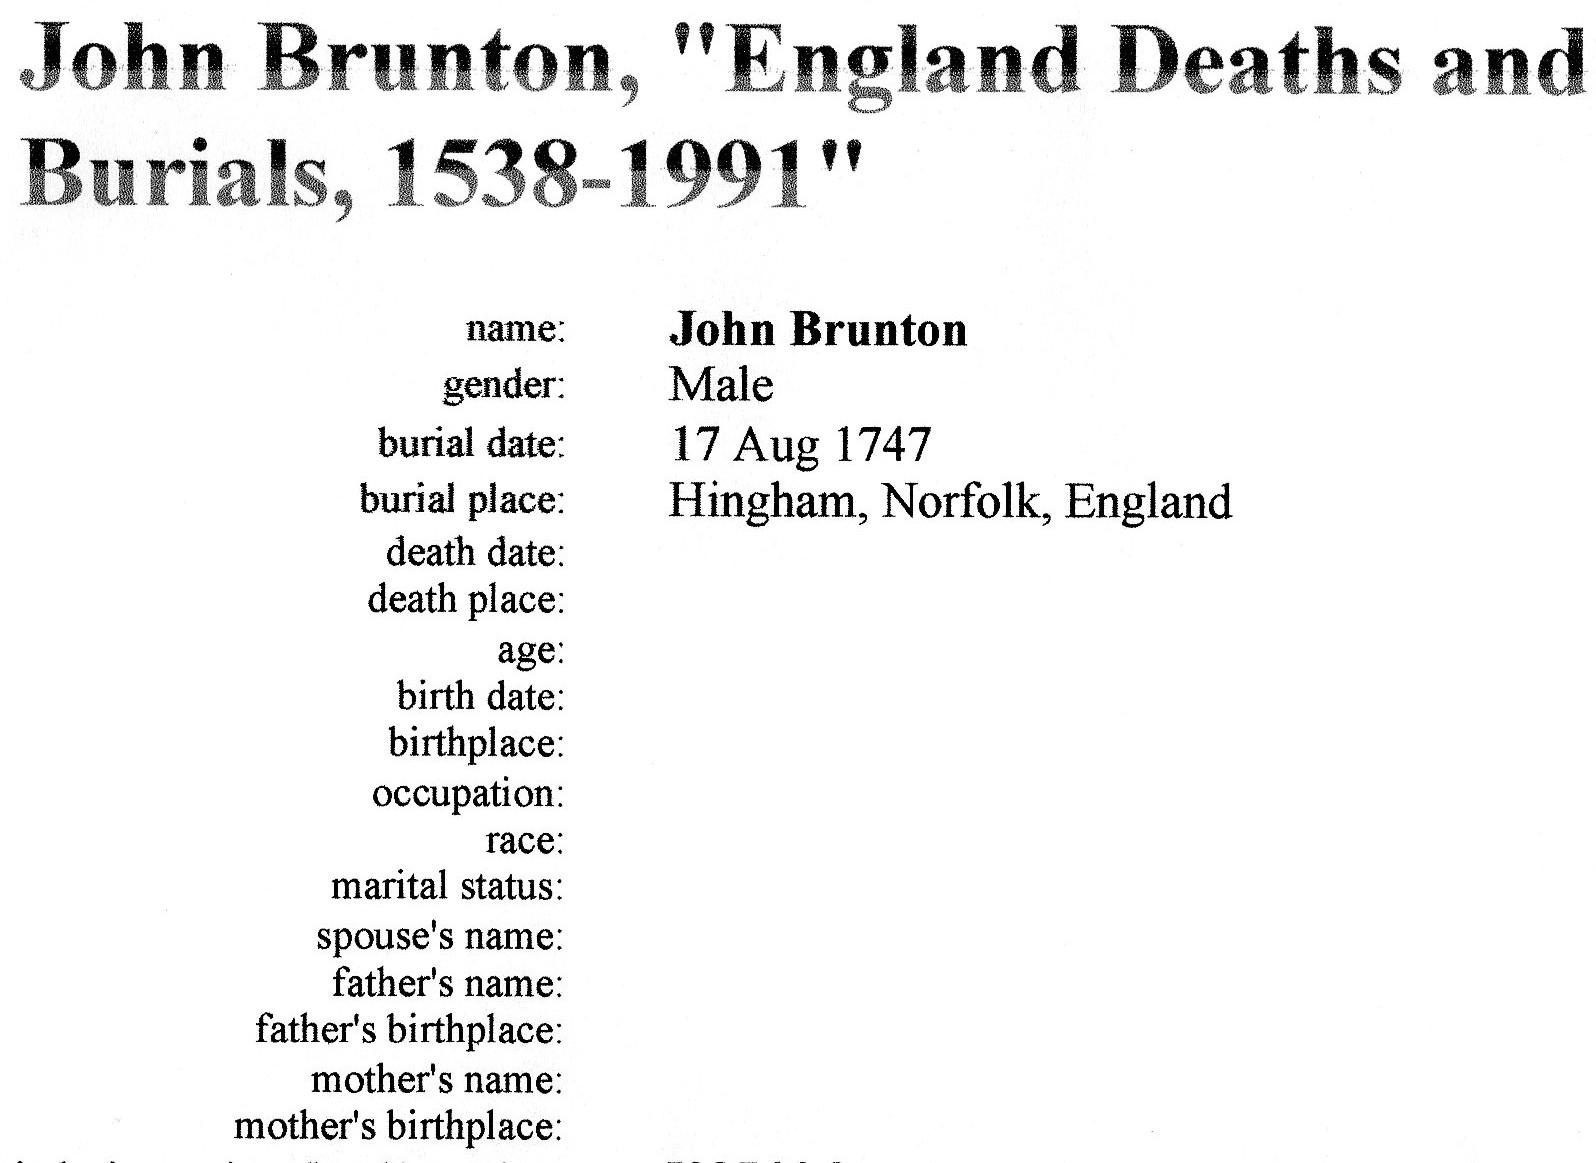 John Brunton